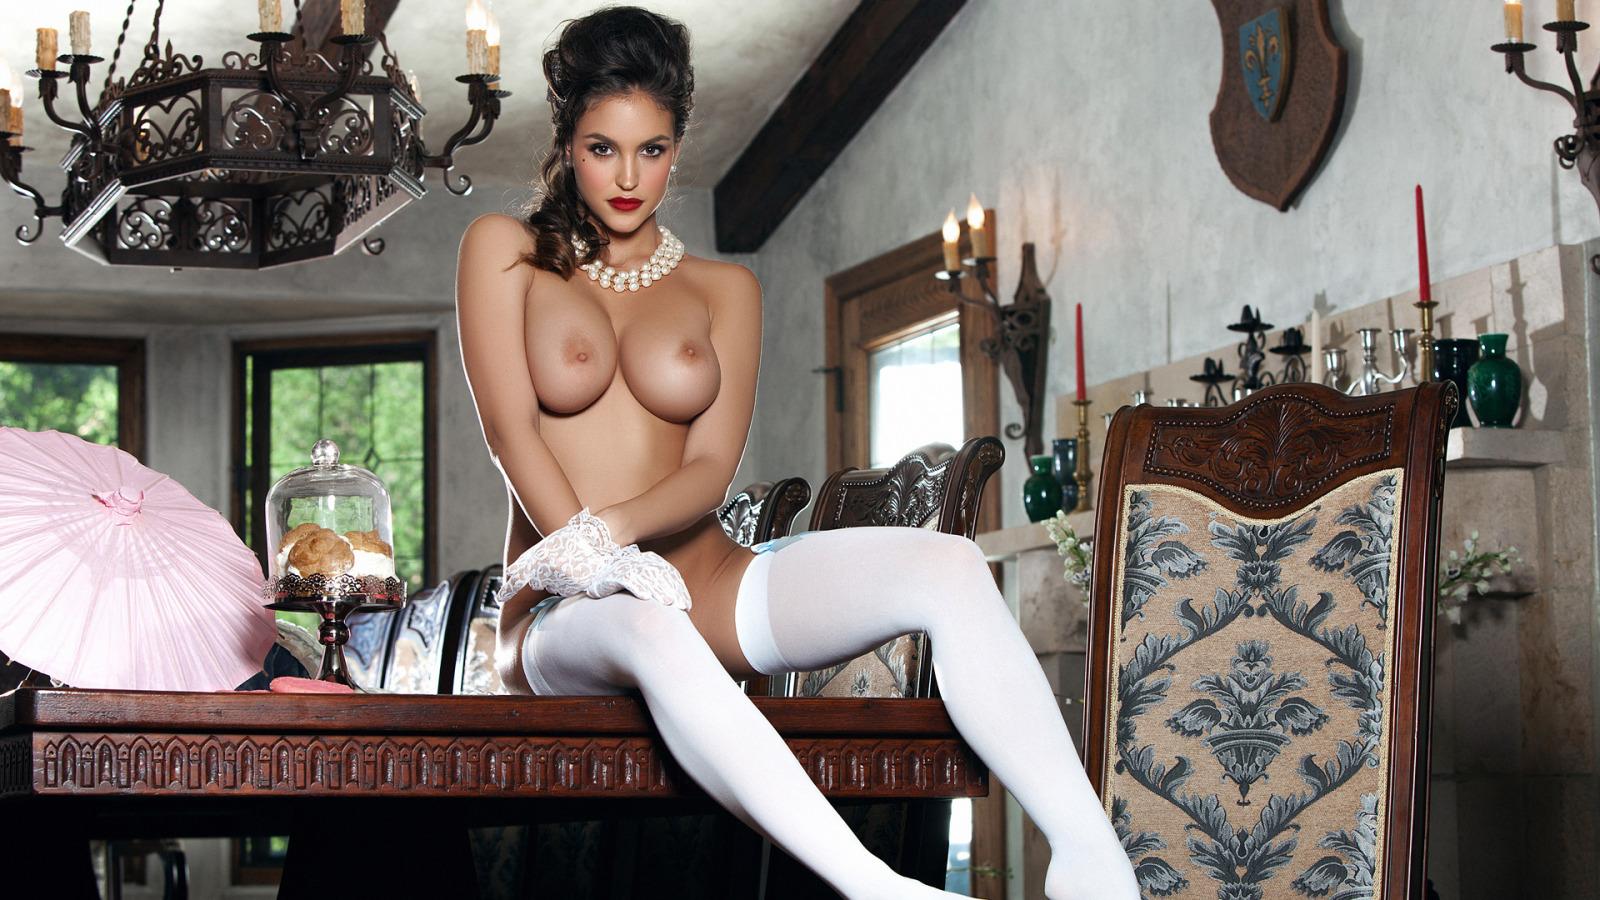 Swedberg vagina, nude massage penis mature homemade video